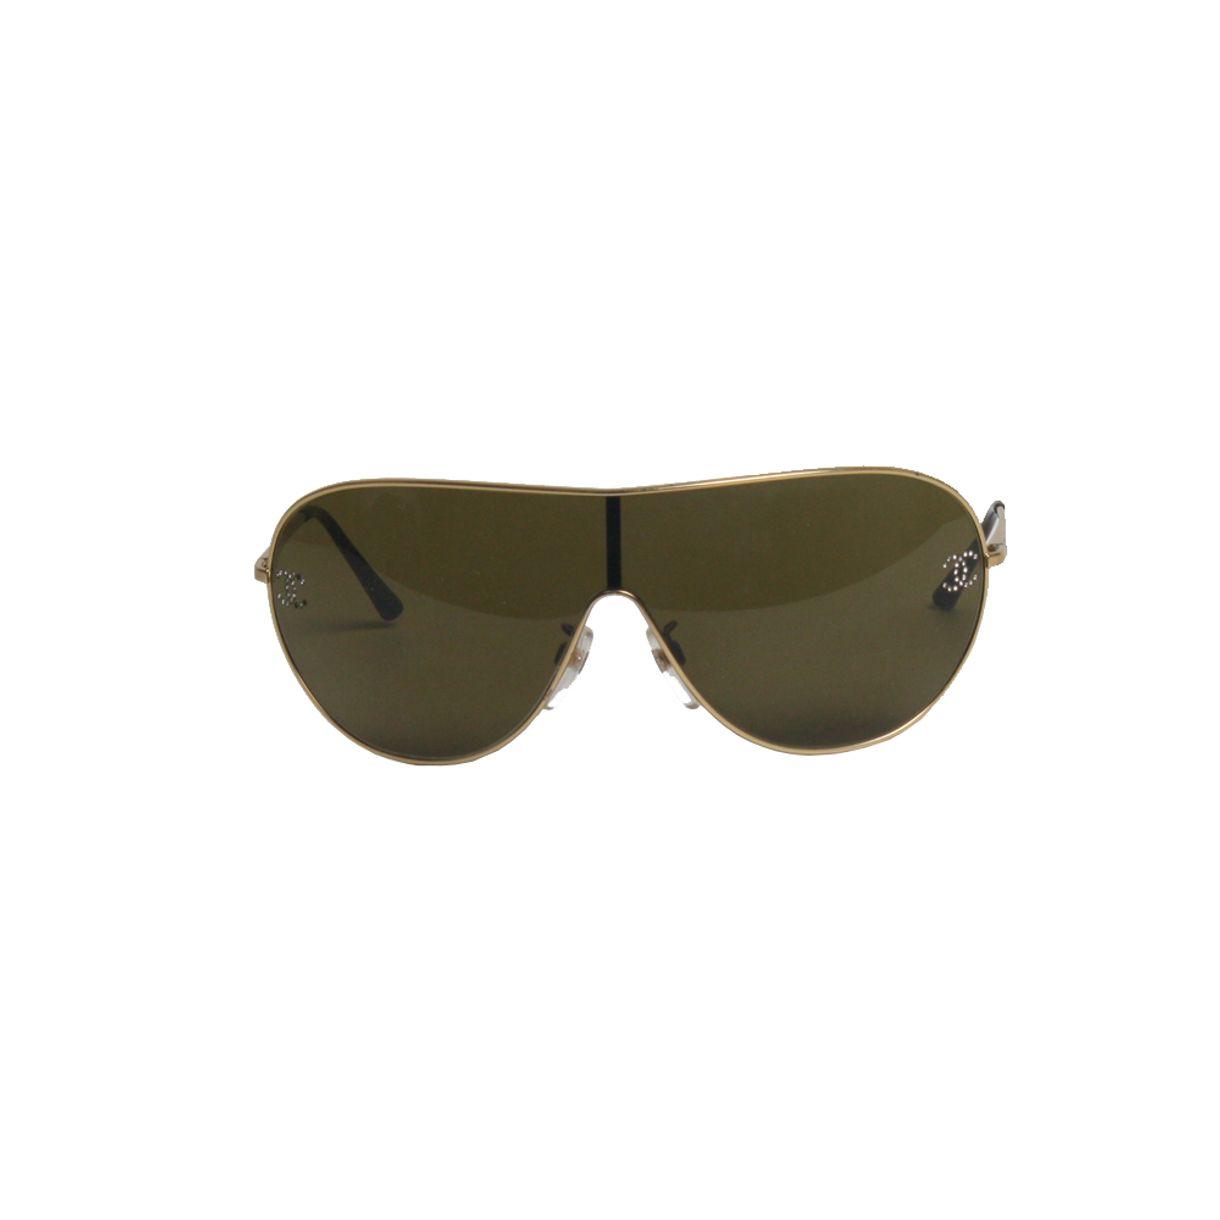 Oculos-Chanel-Dourado